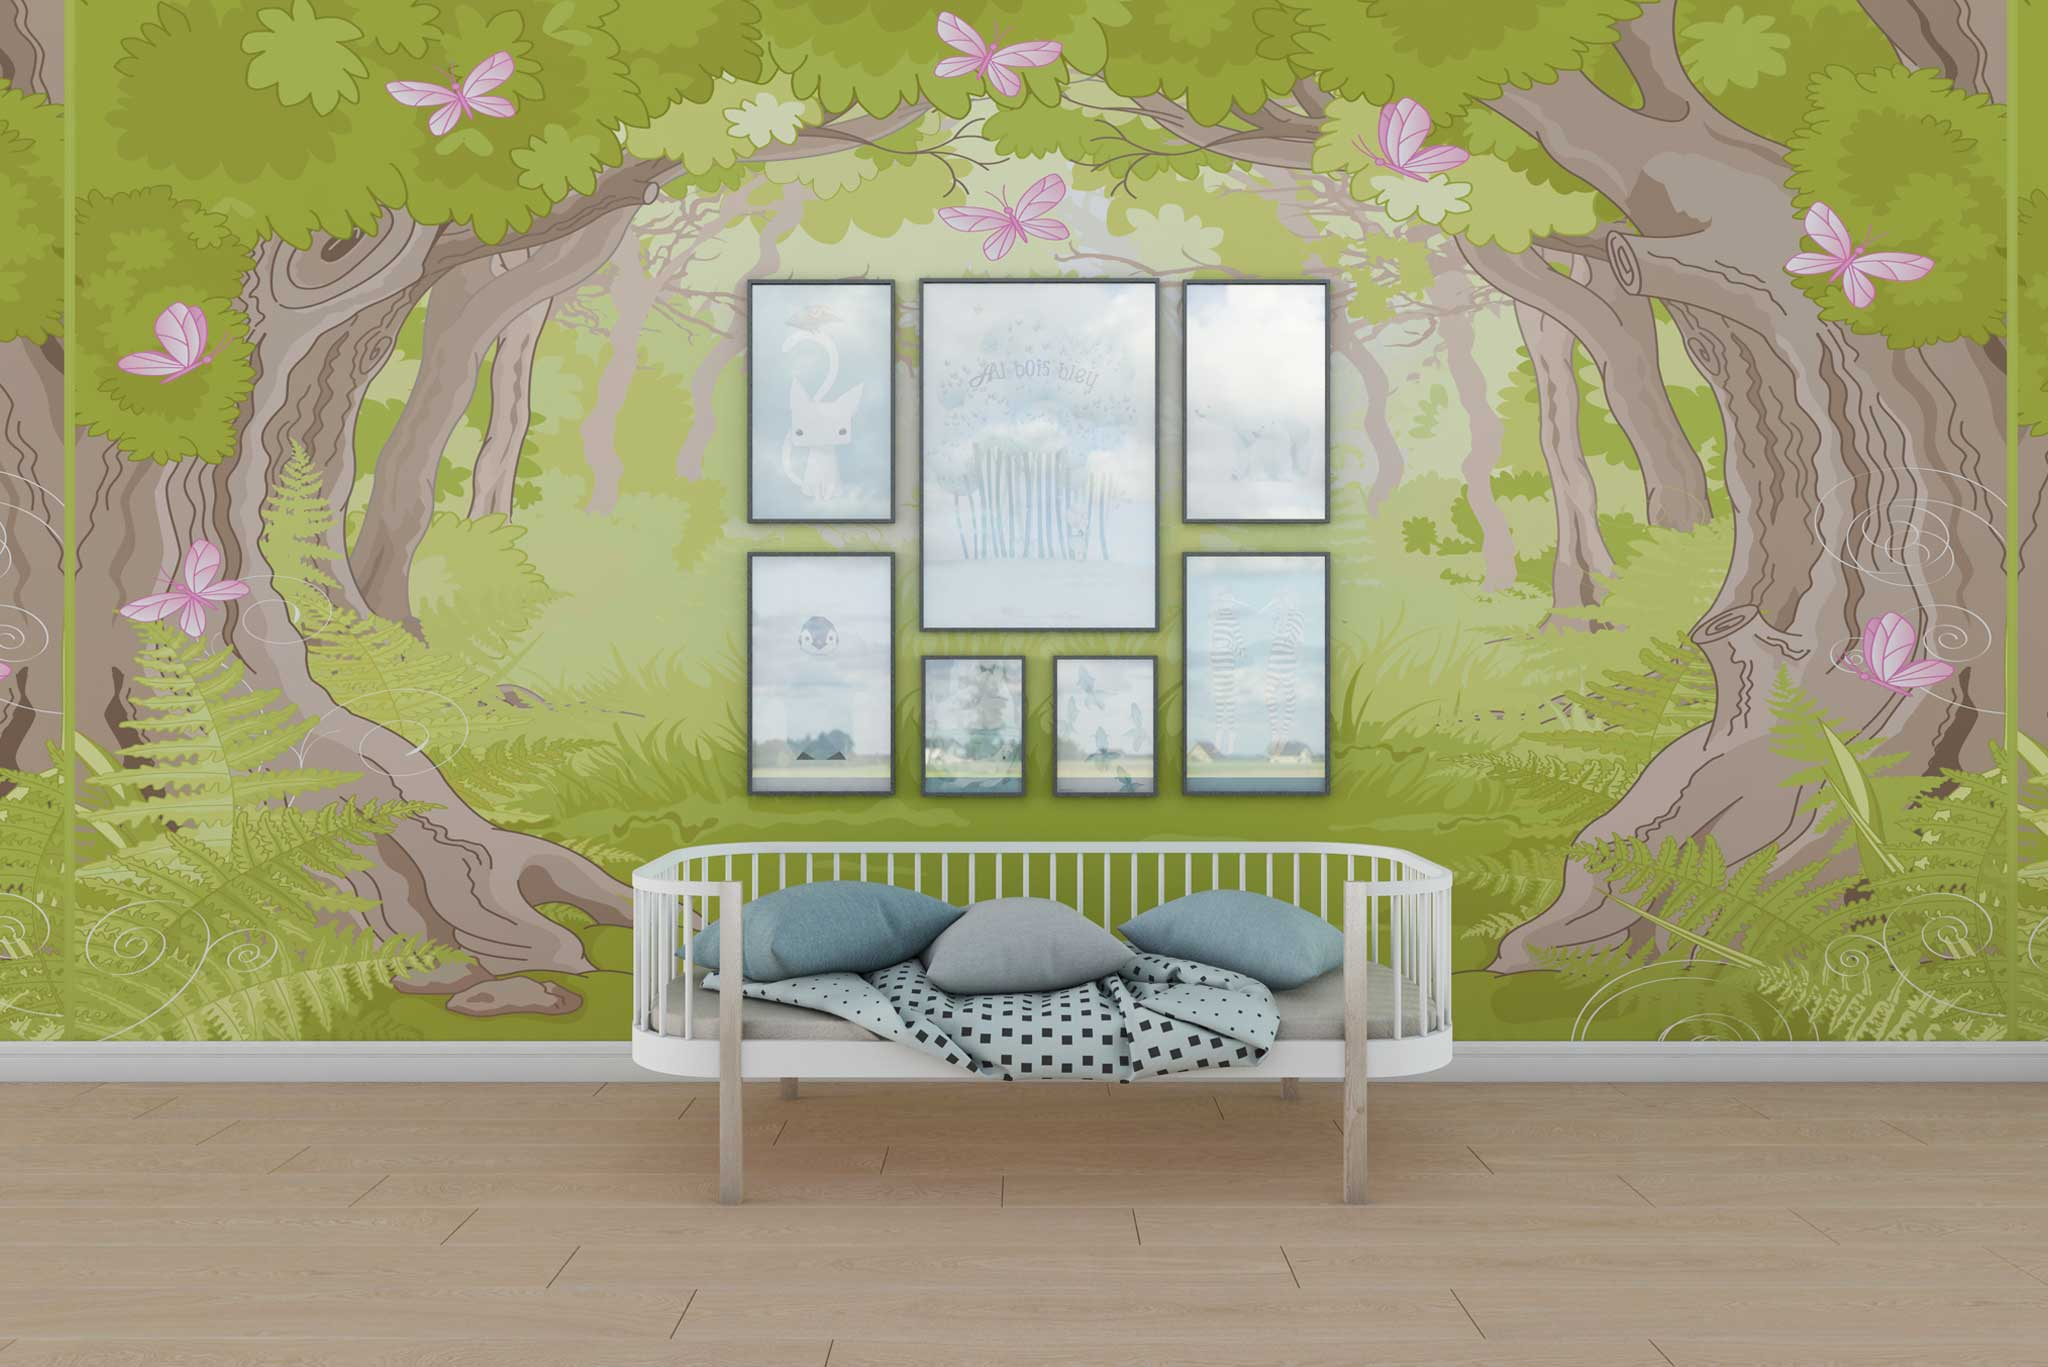 tapet-fototapet-design-personalizat-customizabil-comanda-special-camera-dormitor-copii-model-padurea-fermecata-poiana-fluturi-verde-roz